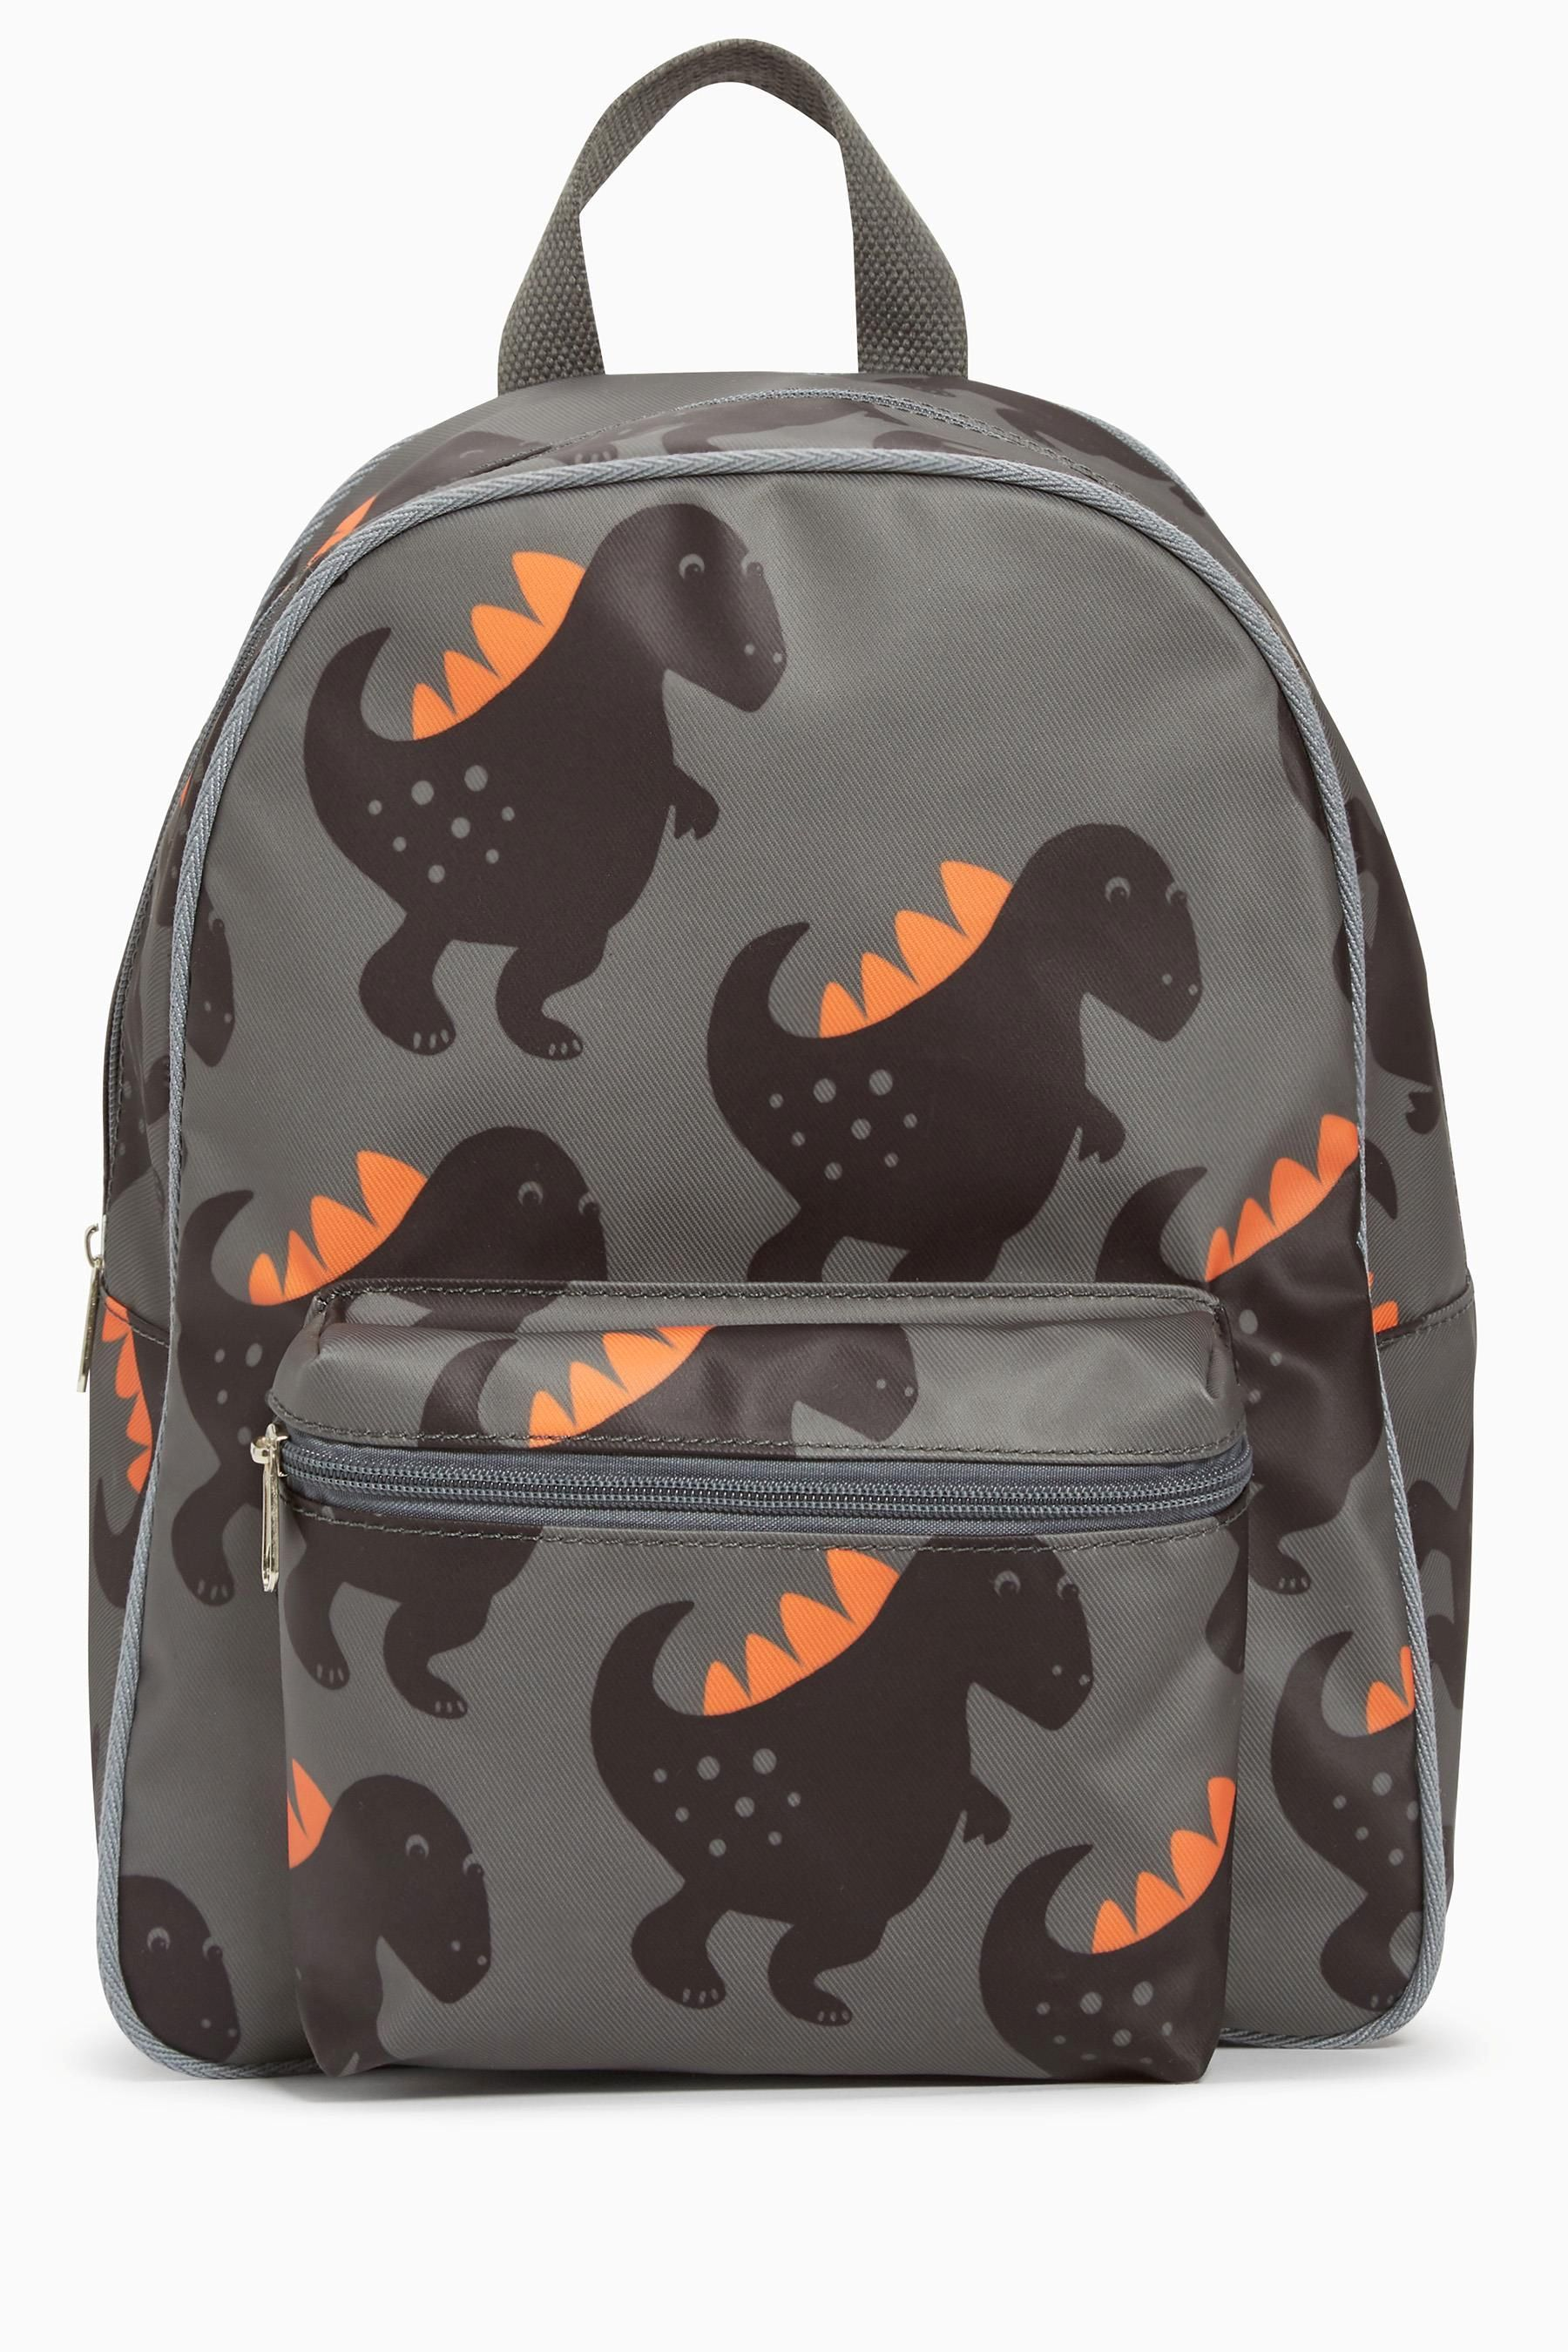 Dinosaur Backpack Cool Dinosaur Bookbag Shoulder Travel Laotop Bag for Men Boys